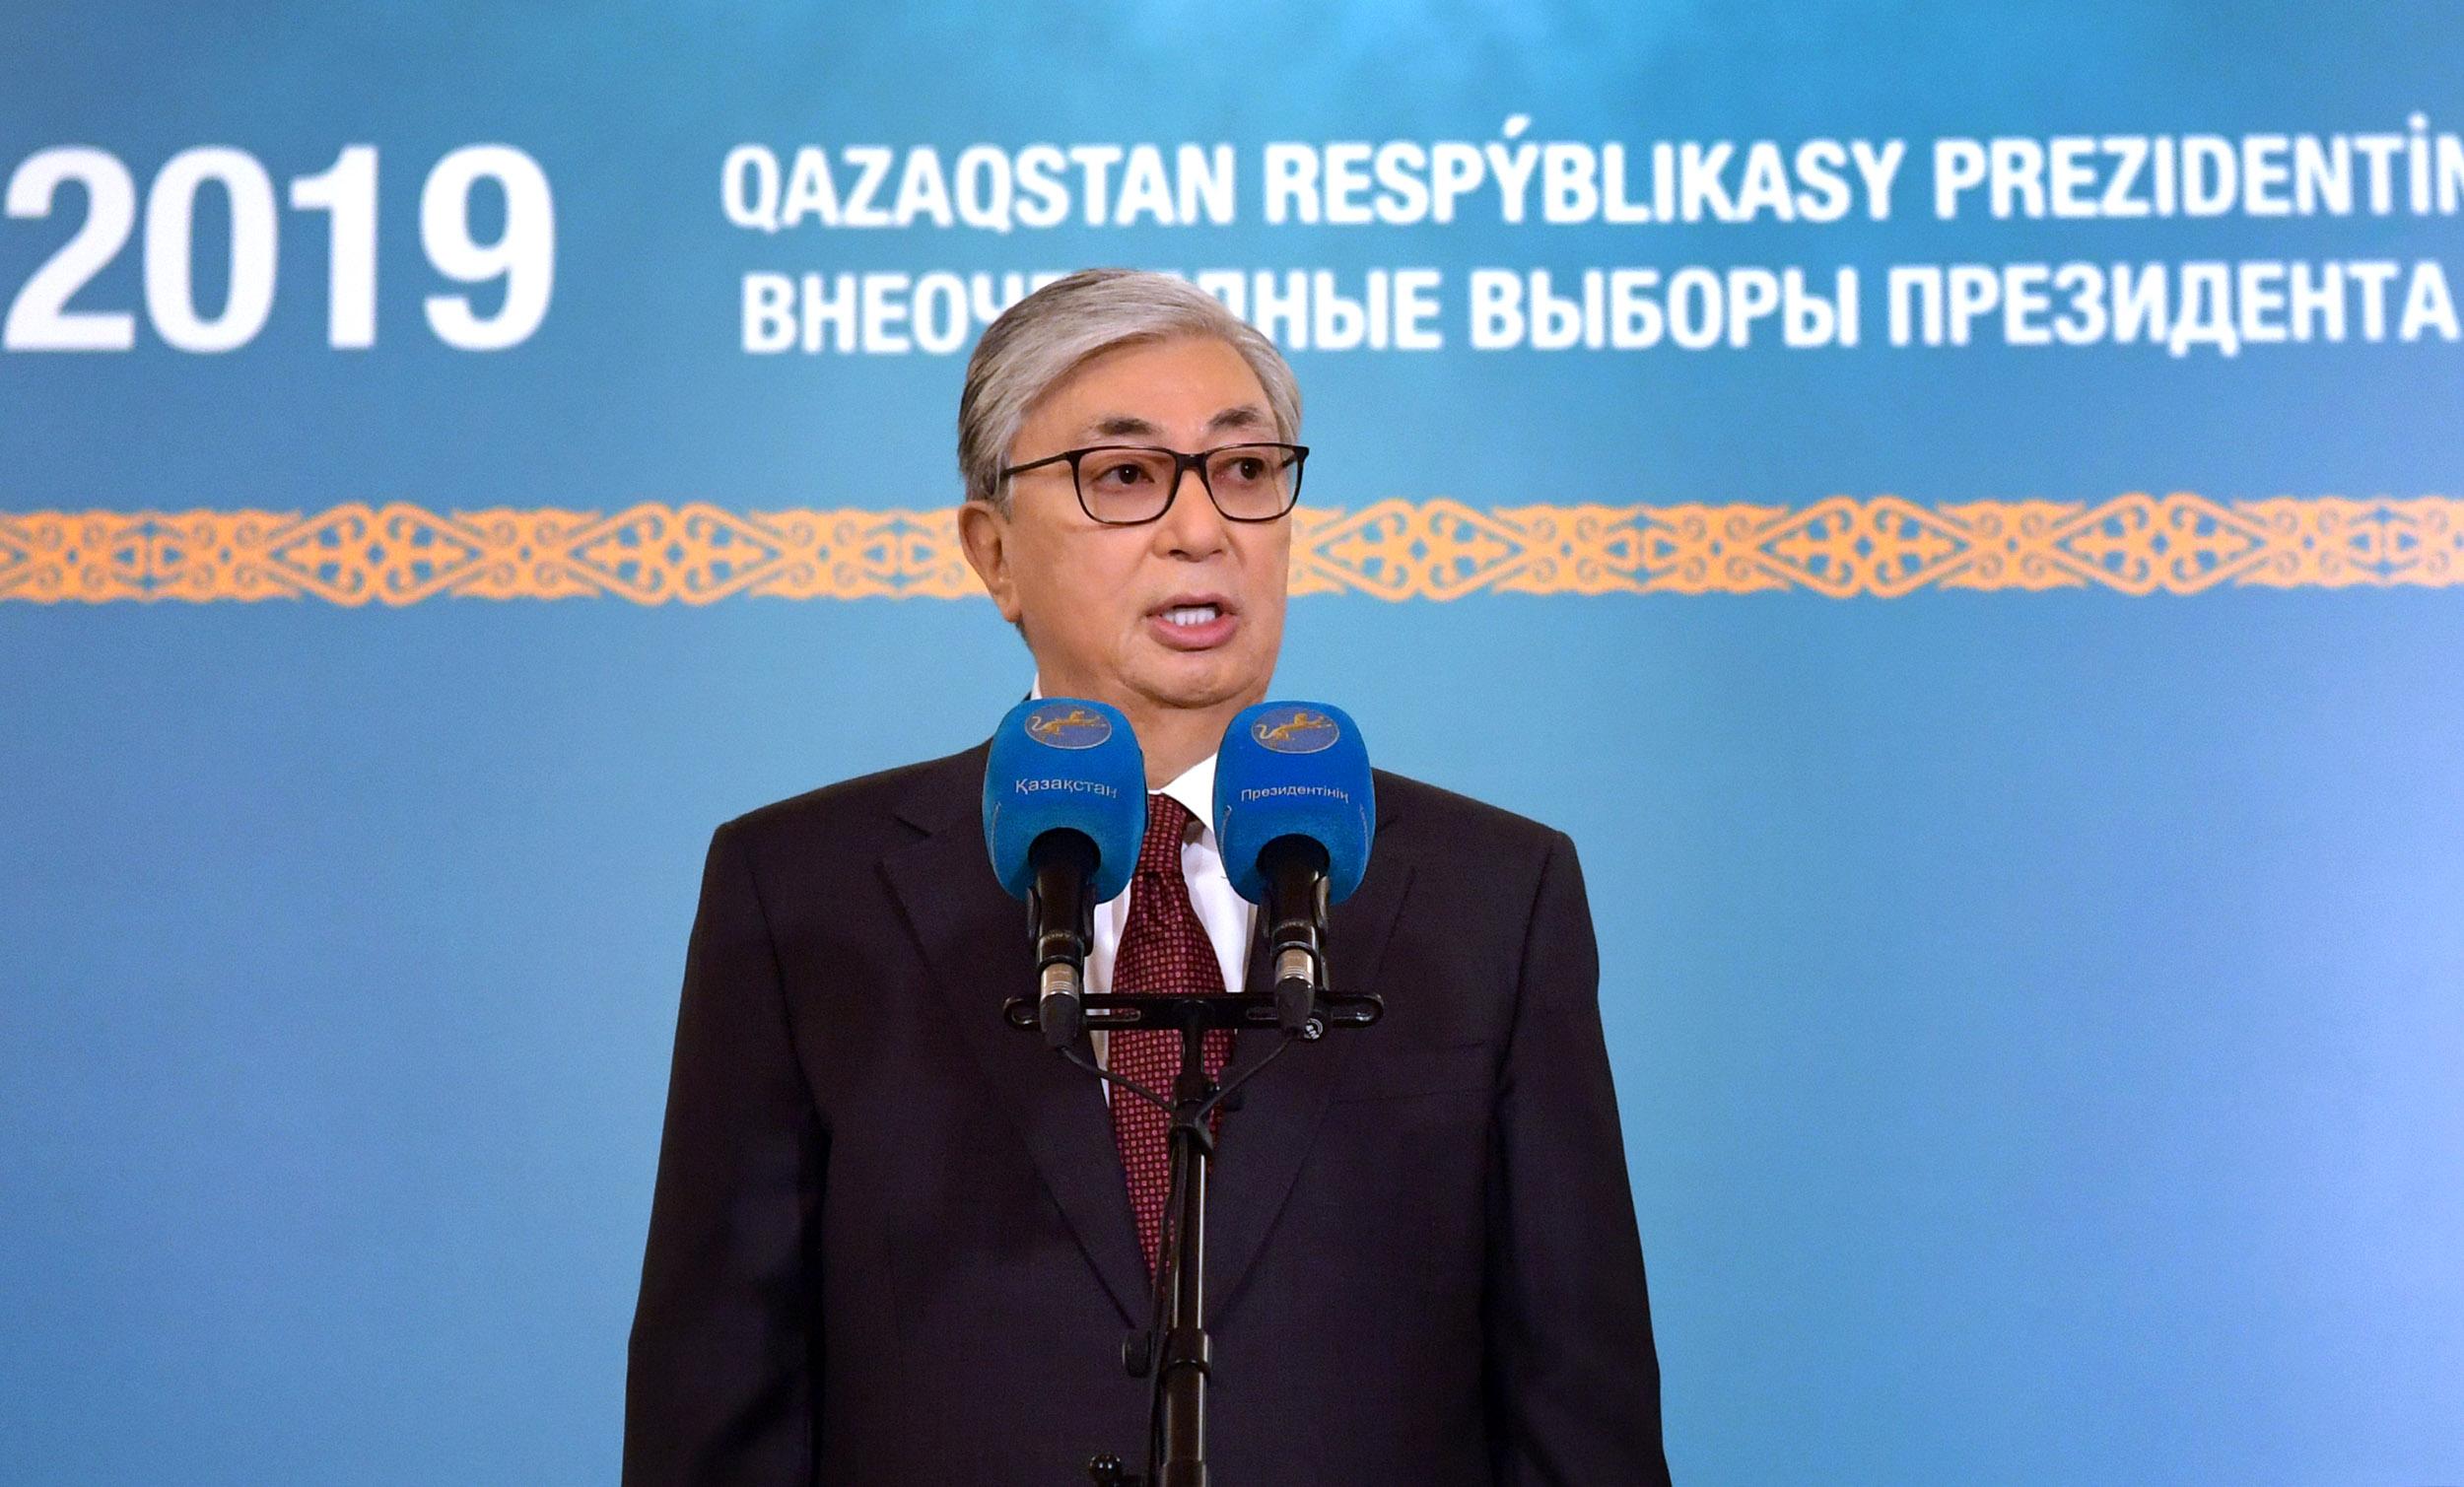 Tokaïev Kazakhstan Président Présidence Politique